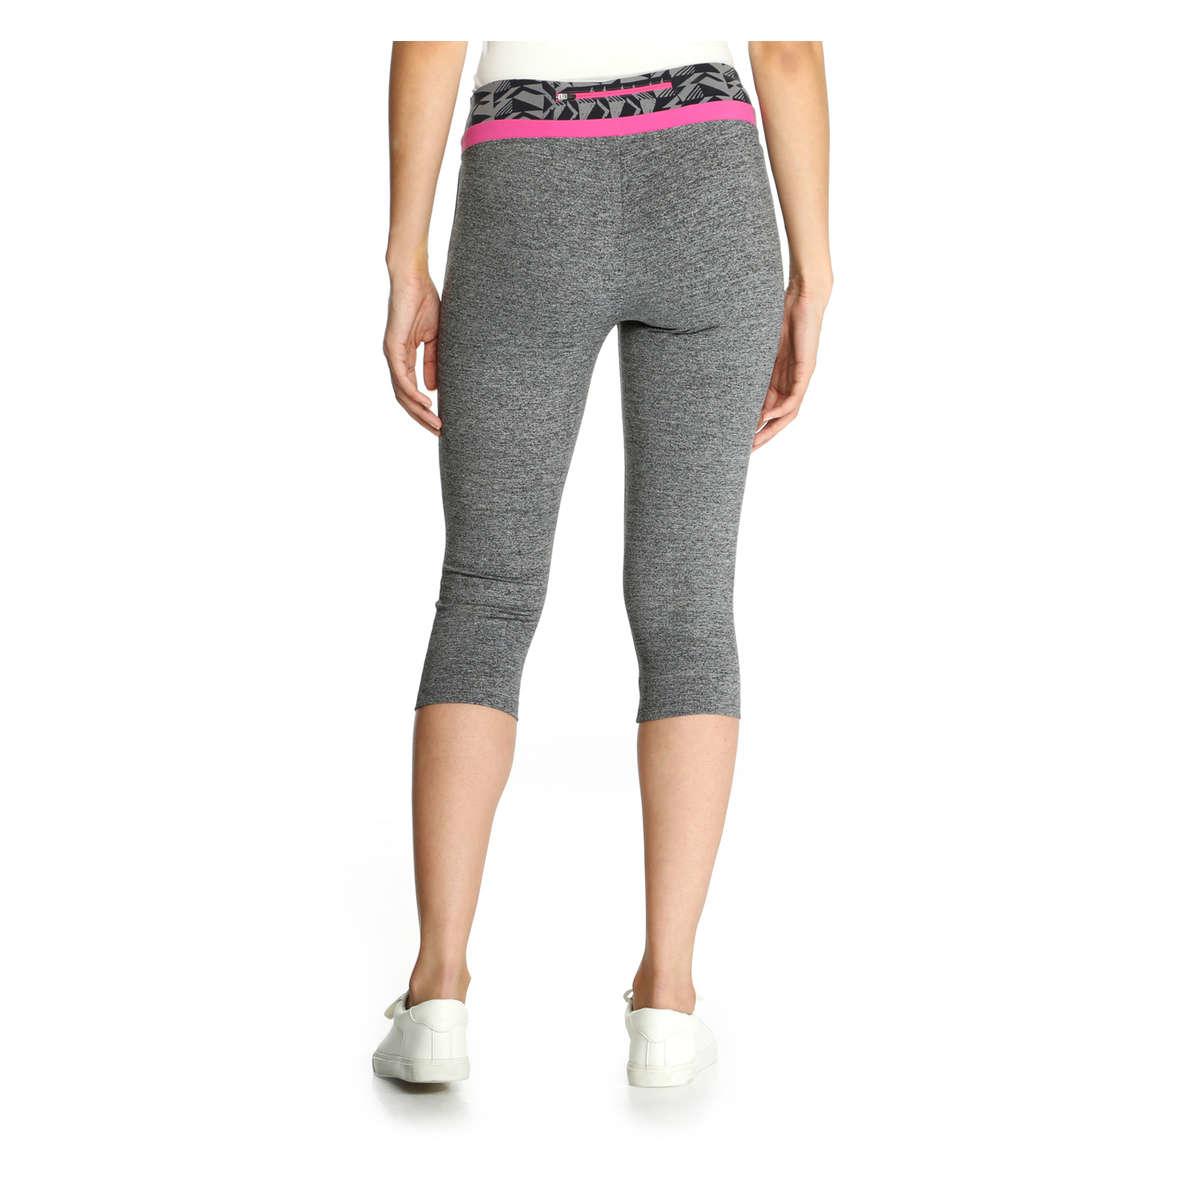 Joe Fresh Contrast Waist Cropped Yoga Legging In Gray